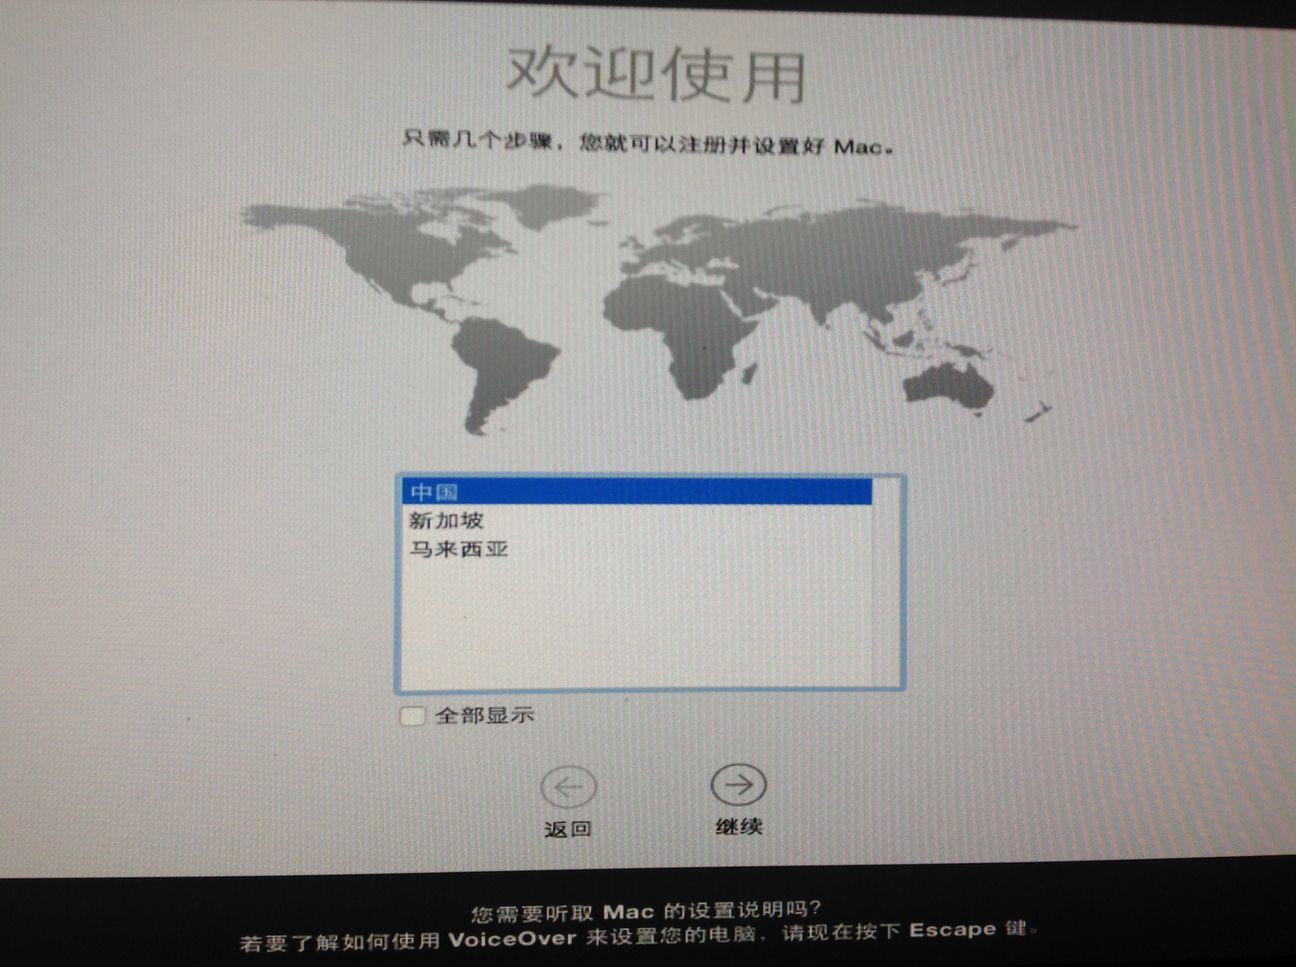 OSX-Setup Wizard